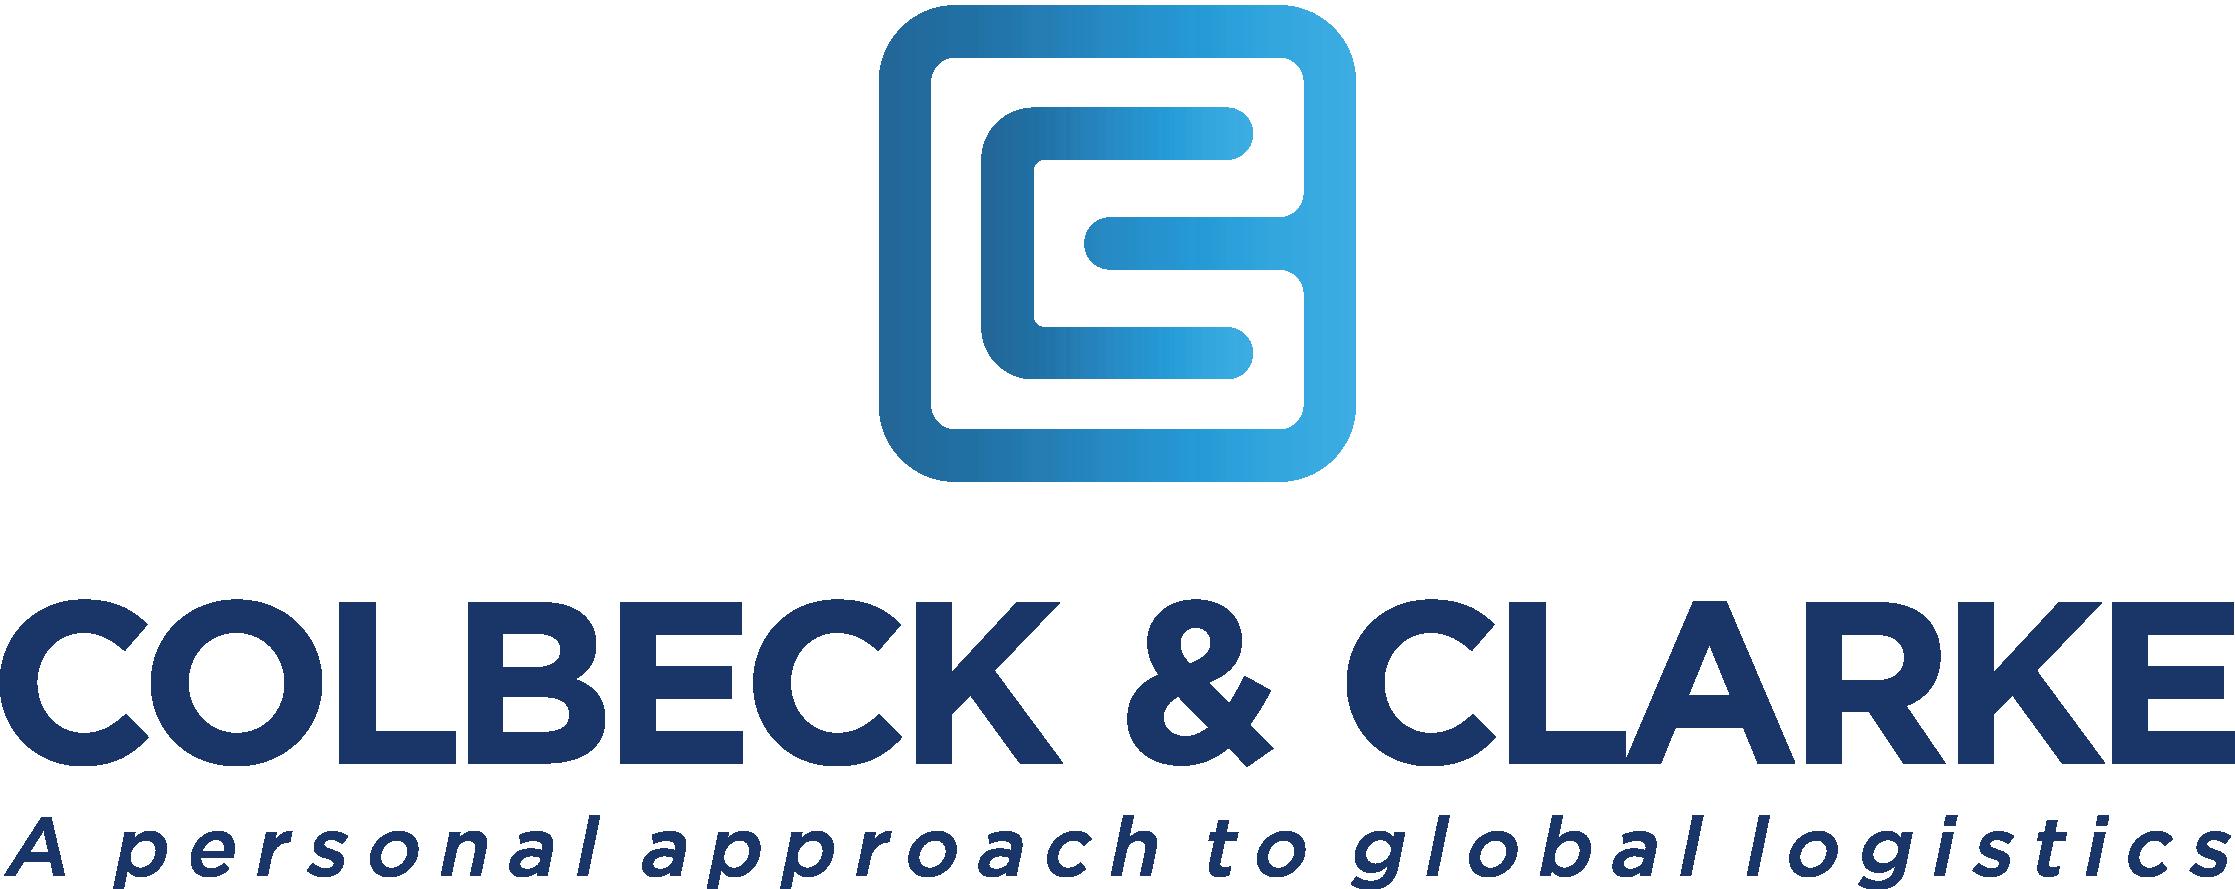 COLBECK & CLARKE